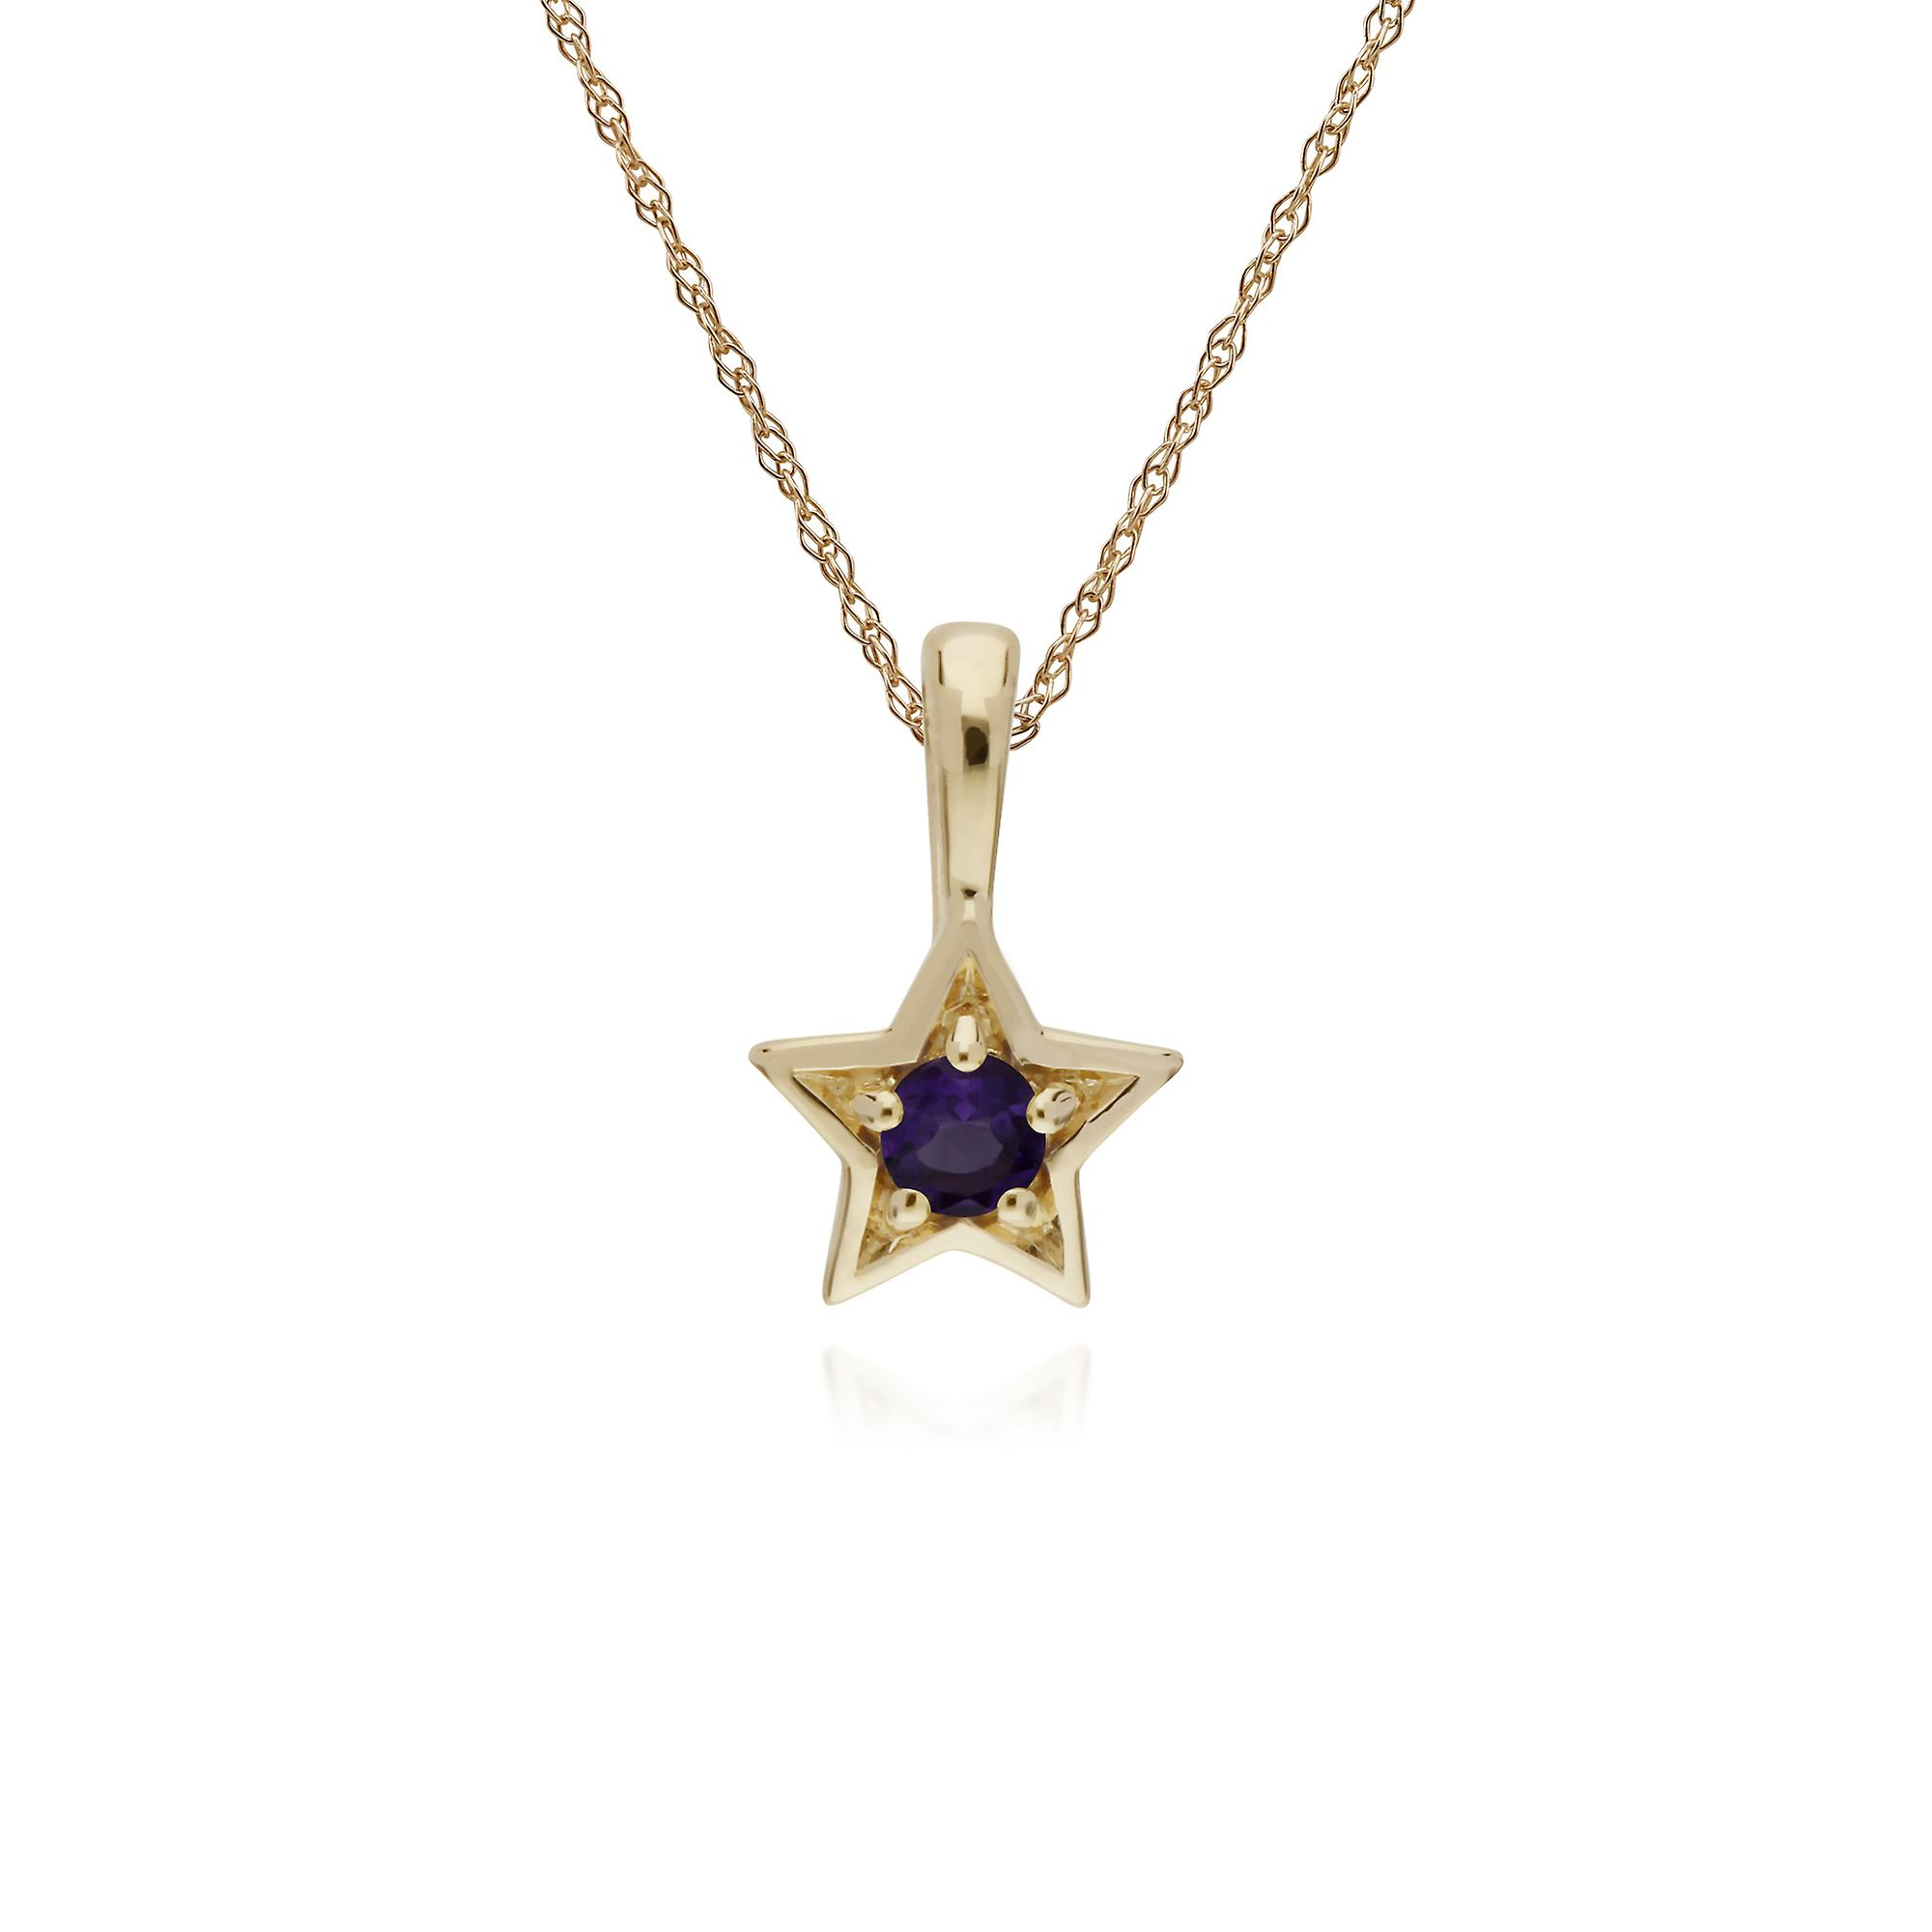 Gemondo 9ct Yellow Gold Amethyst Single Stone Star Pendant on 45cm Chain